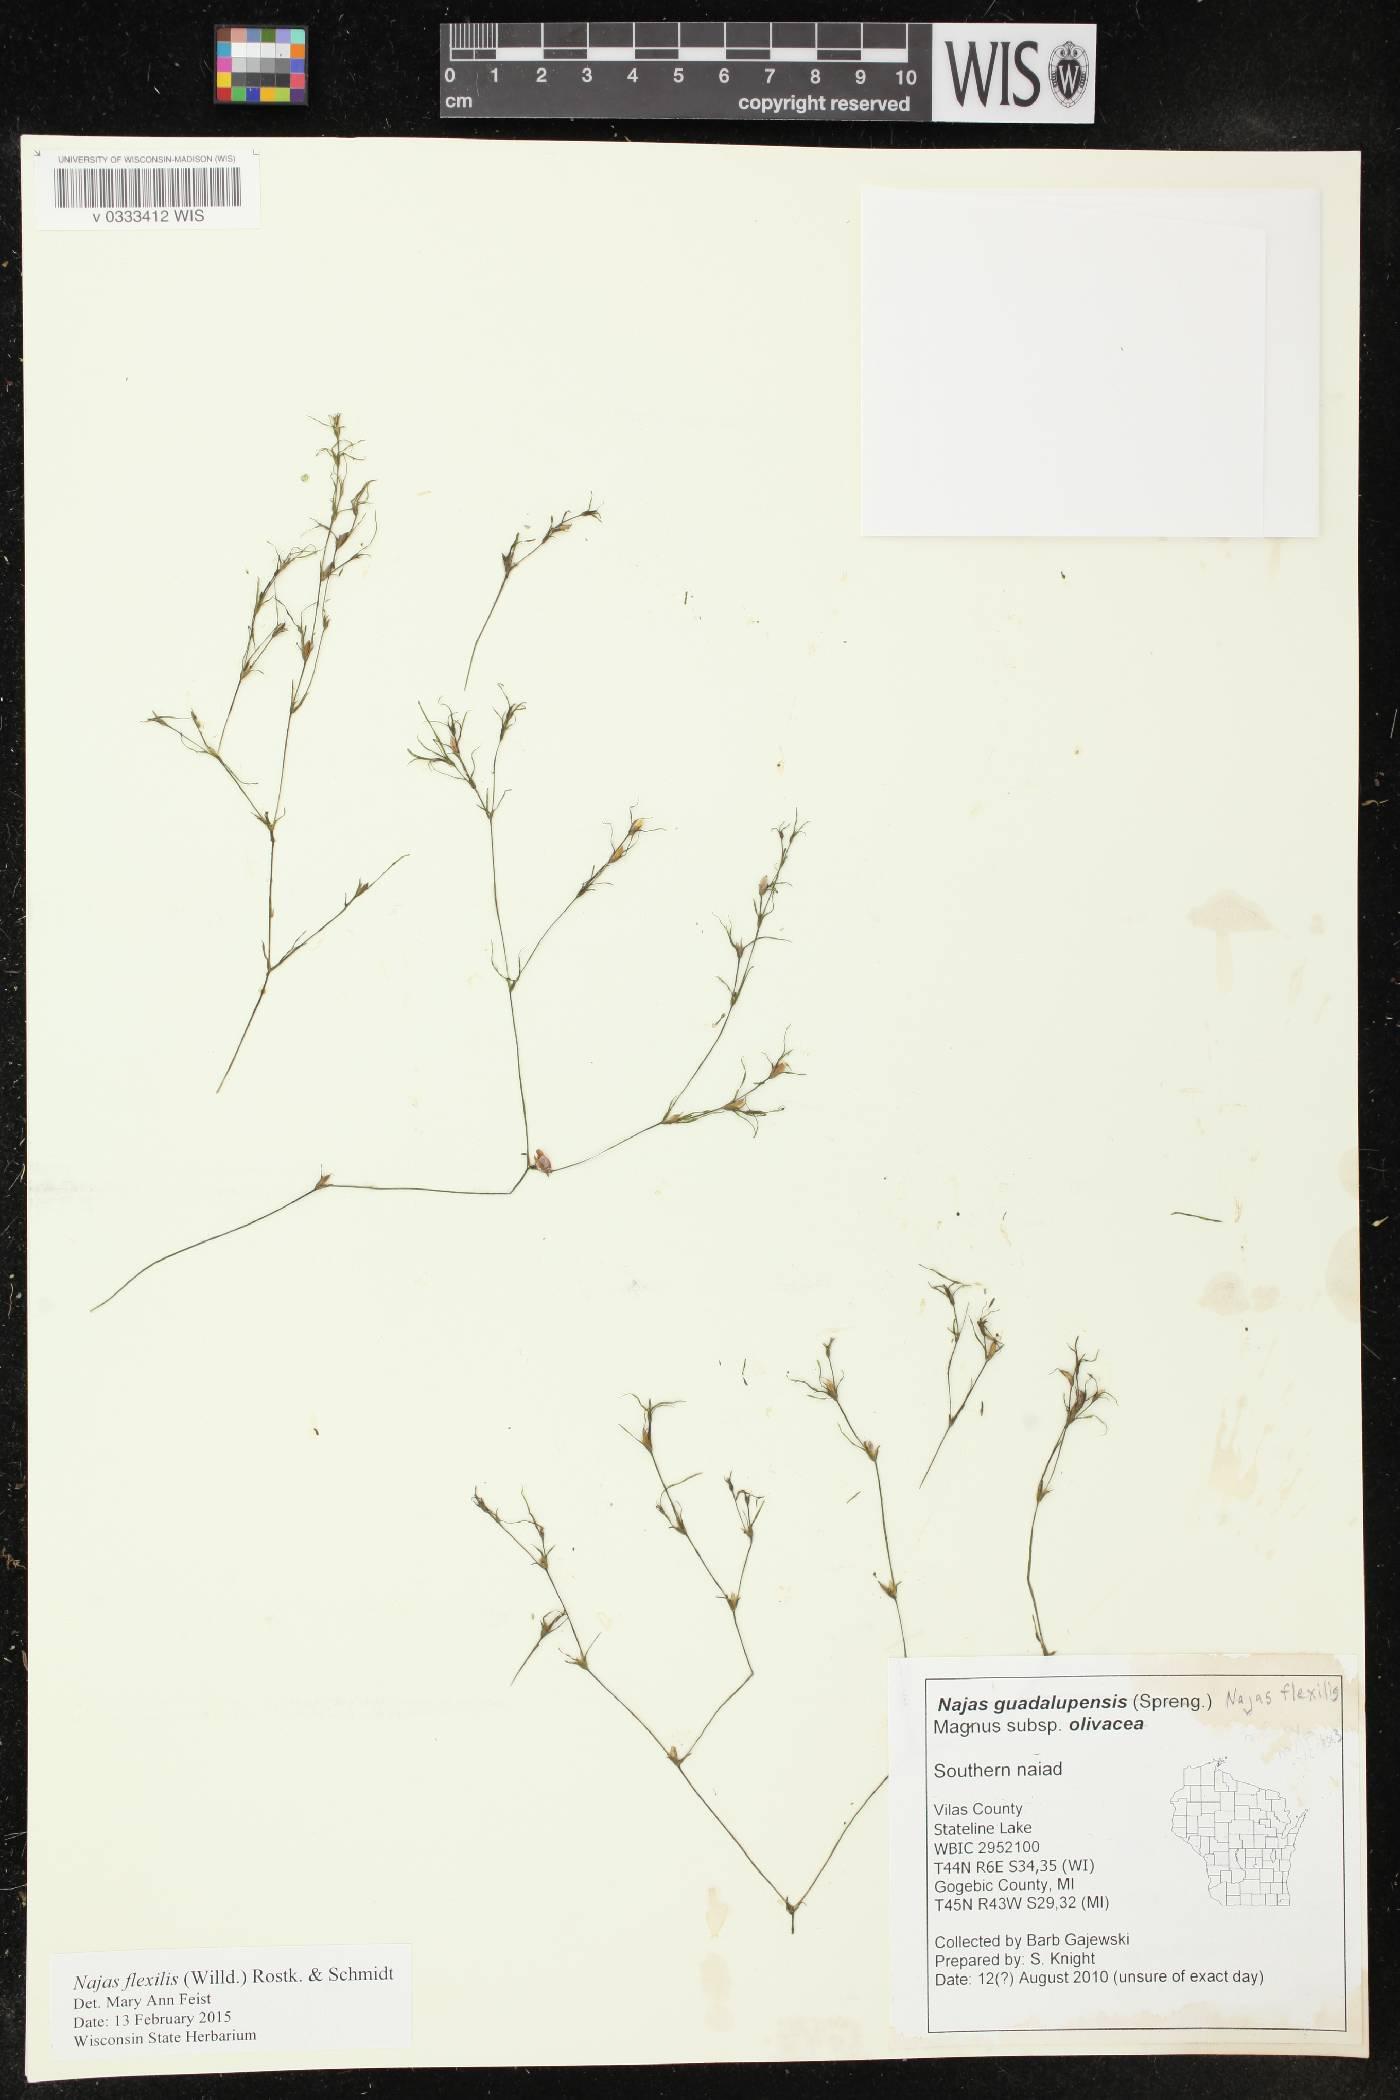 Najas guadalupensis subsp. olivacea image